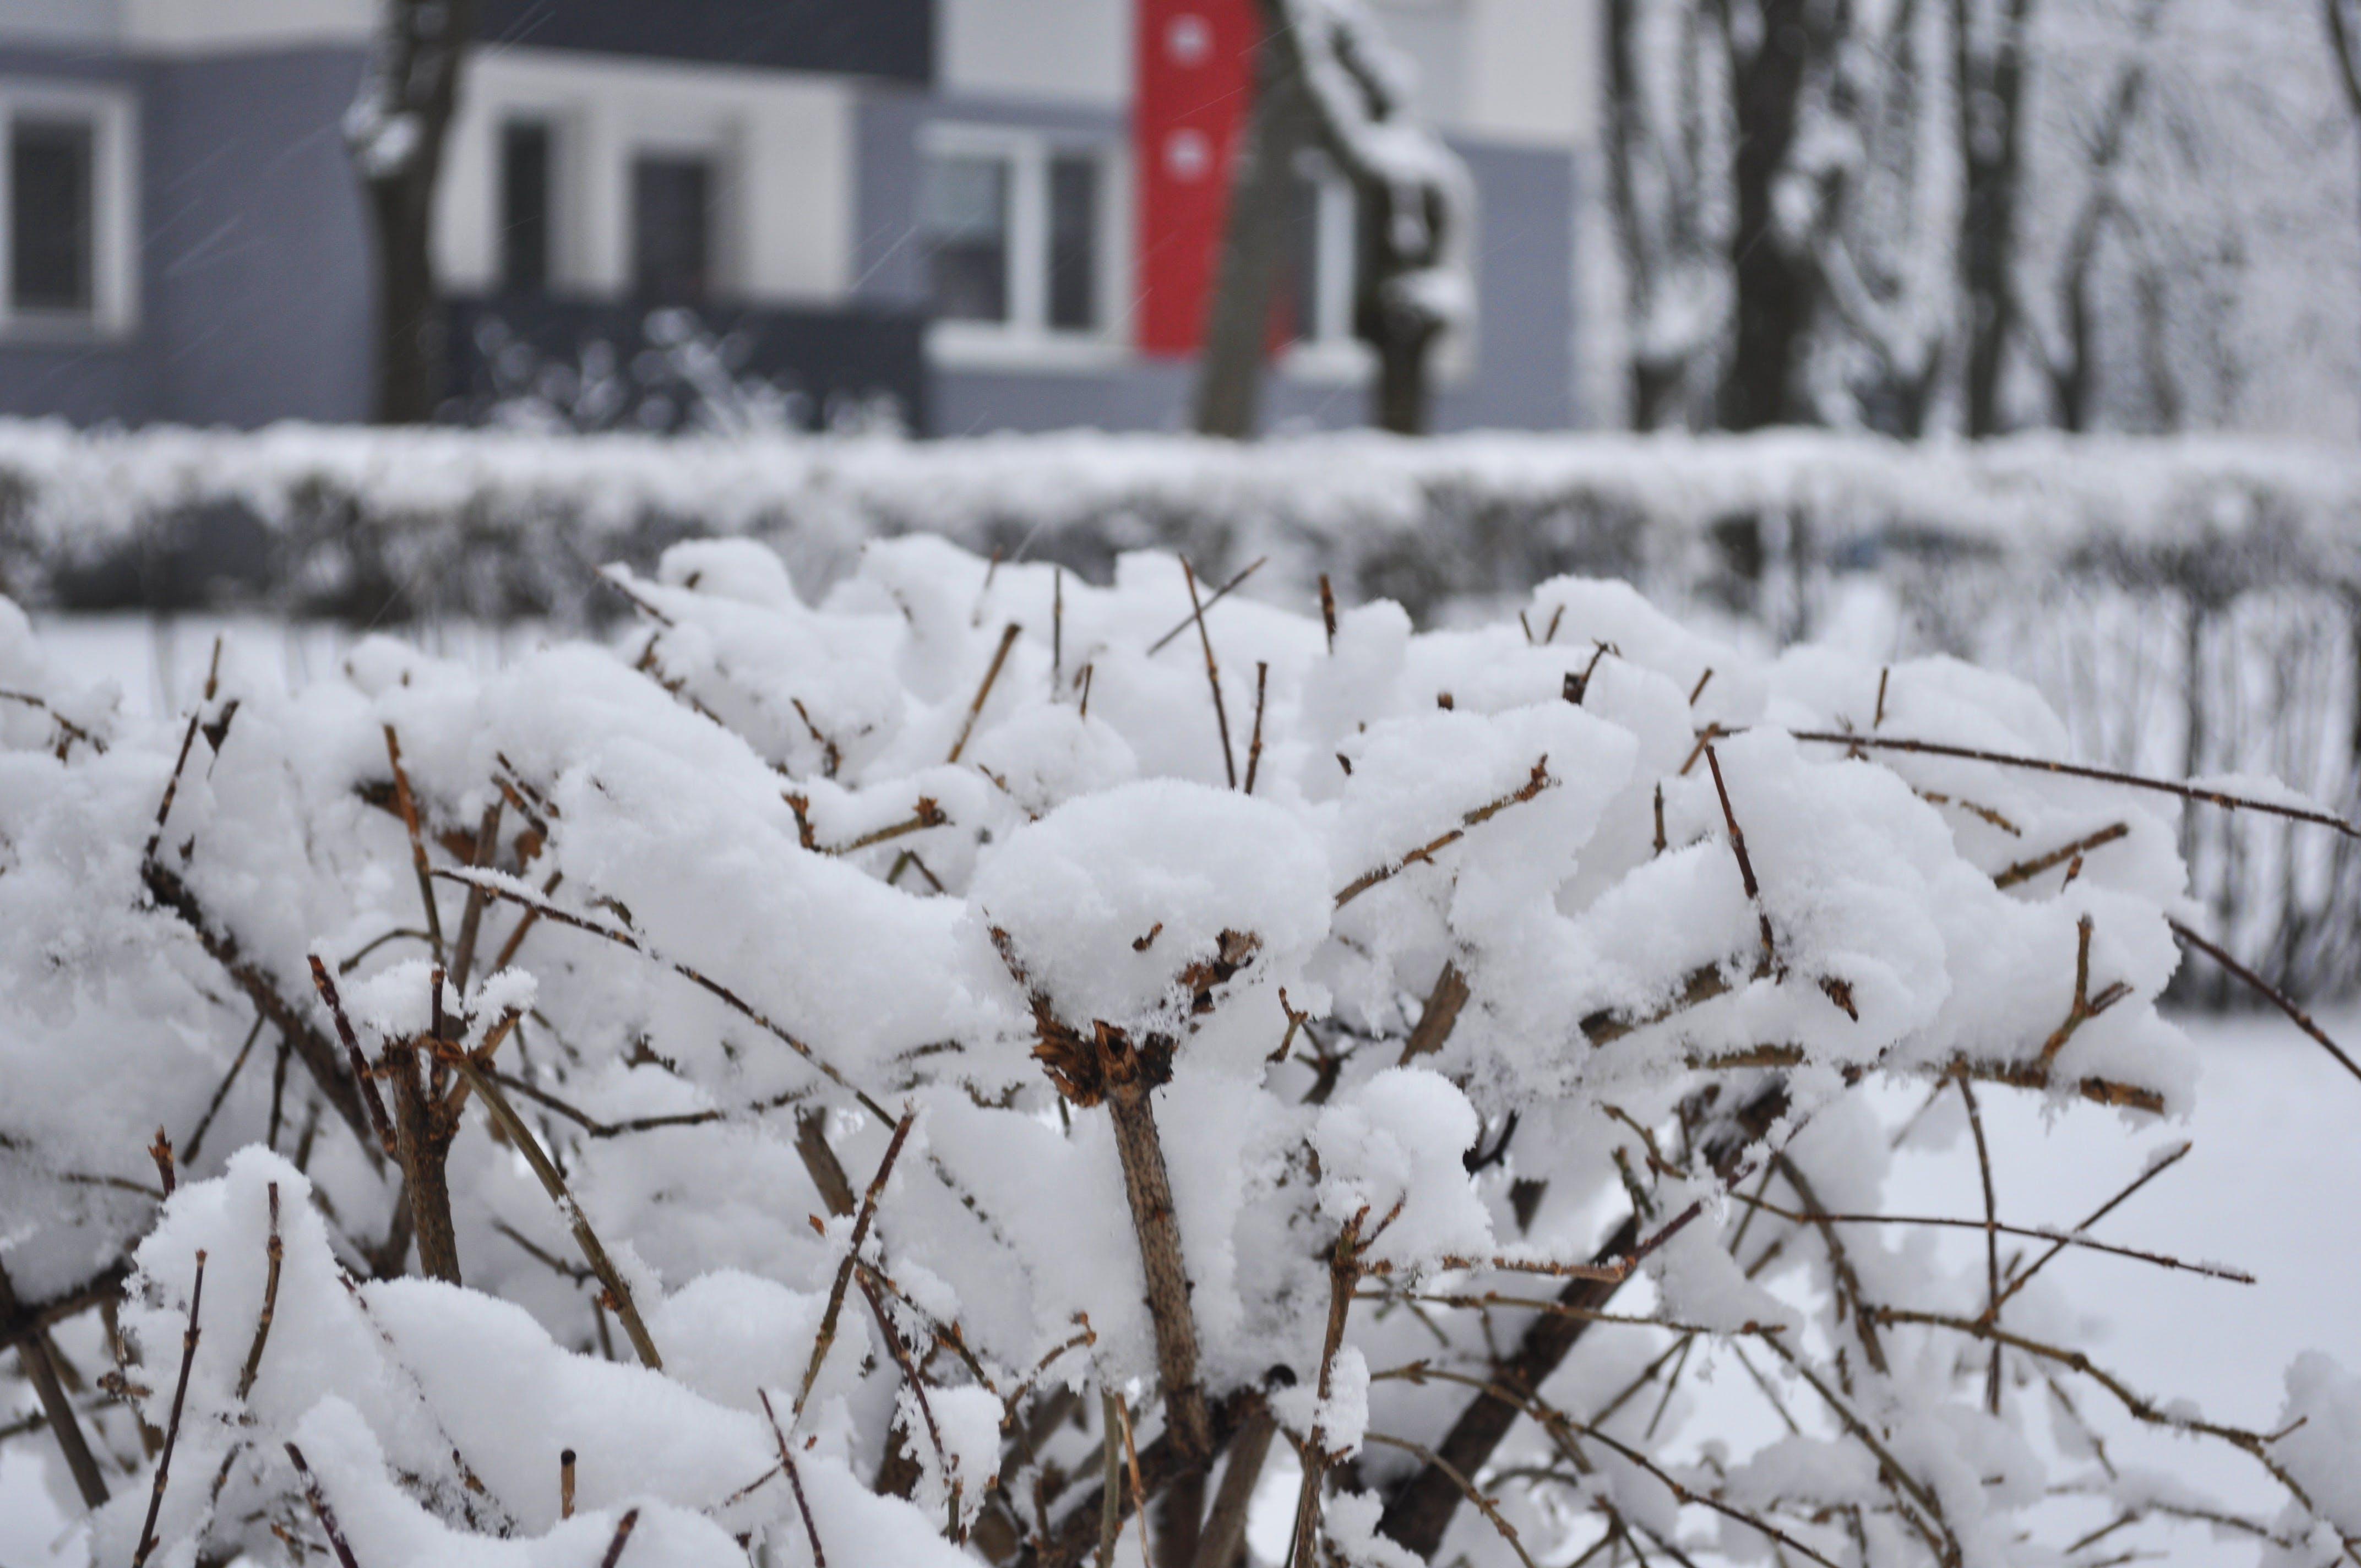 Immagine gratuita di alberi, bianco, cespugli, cespuglio